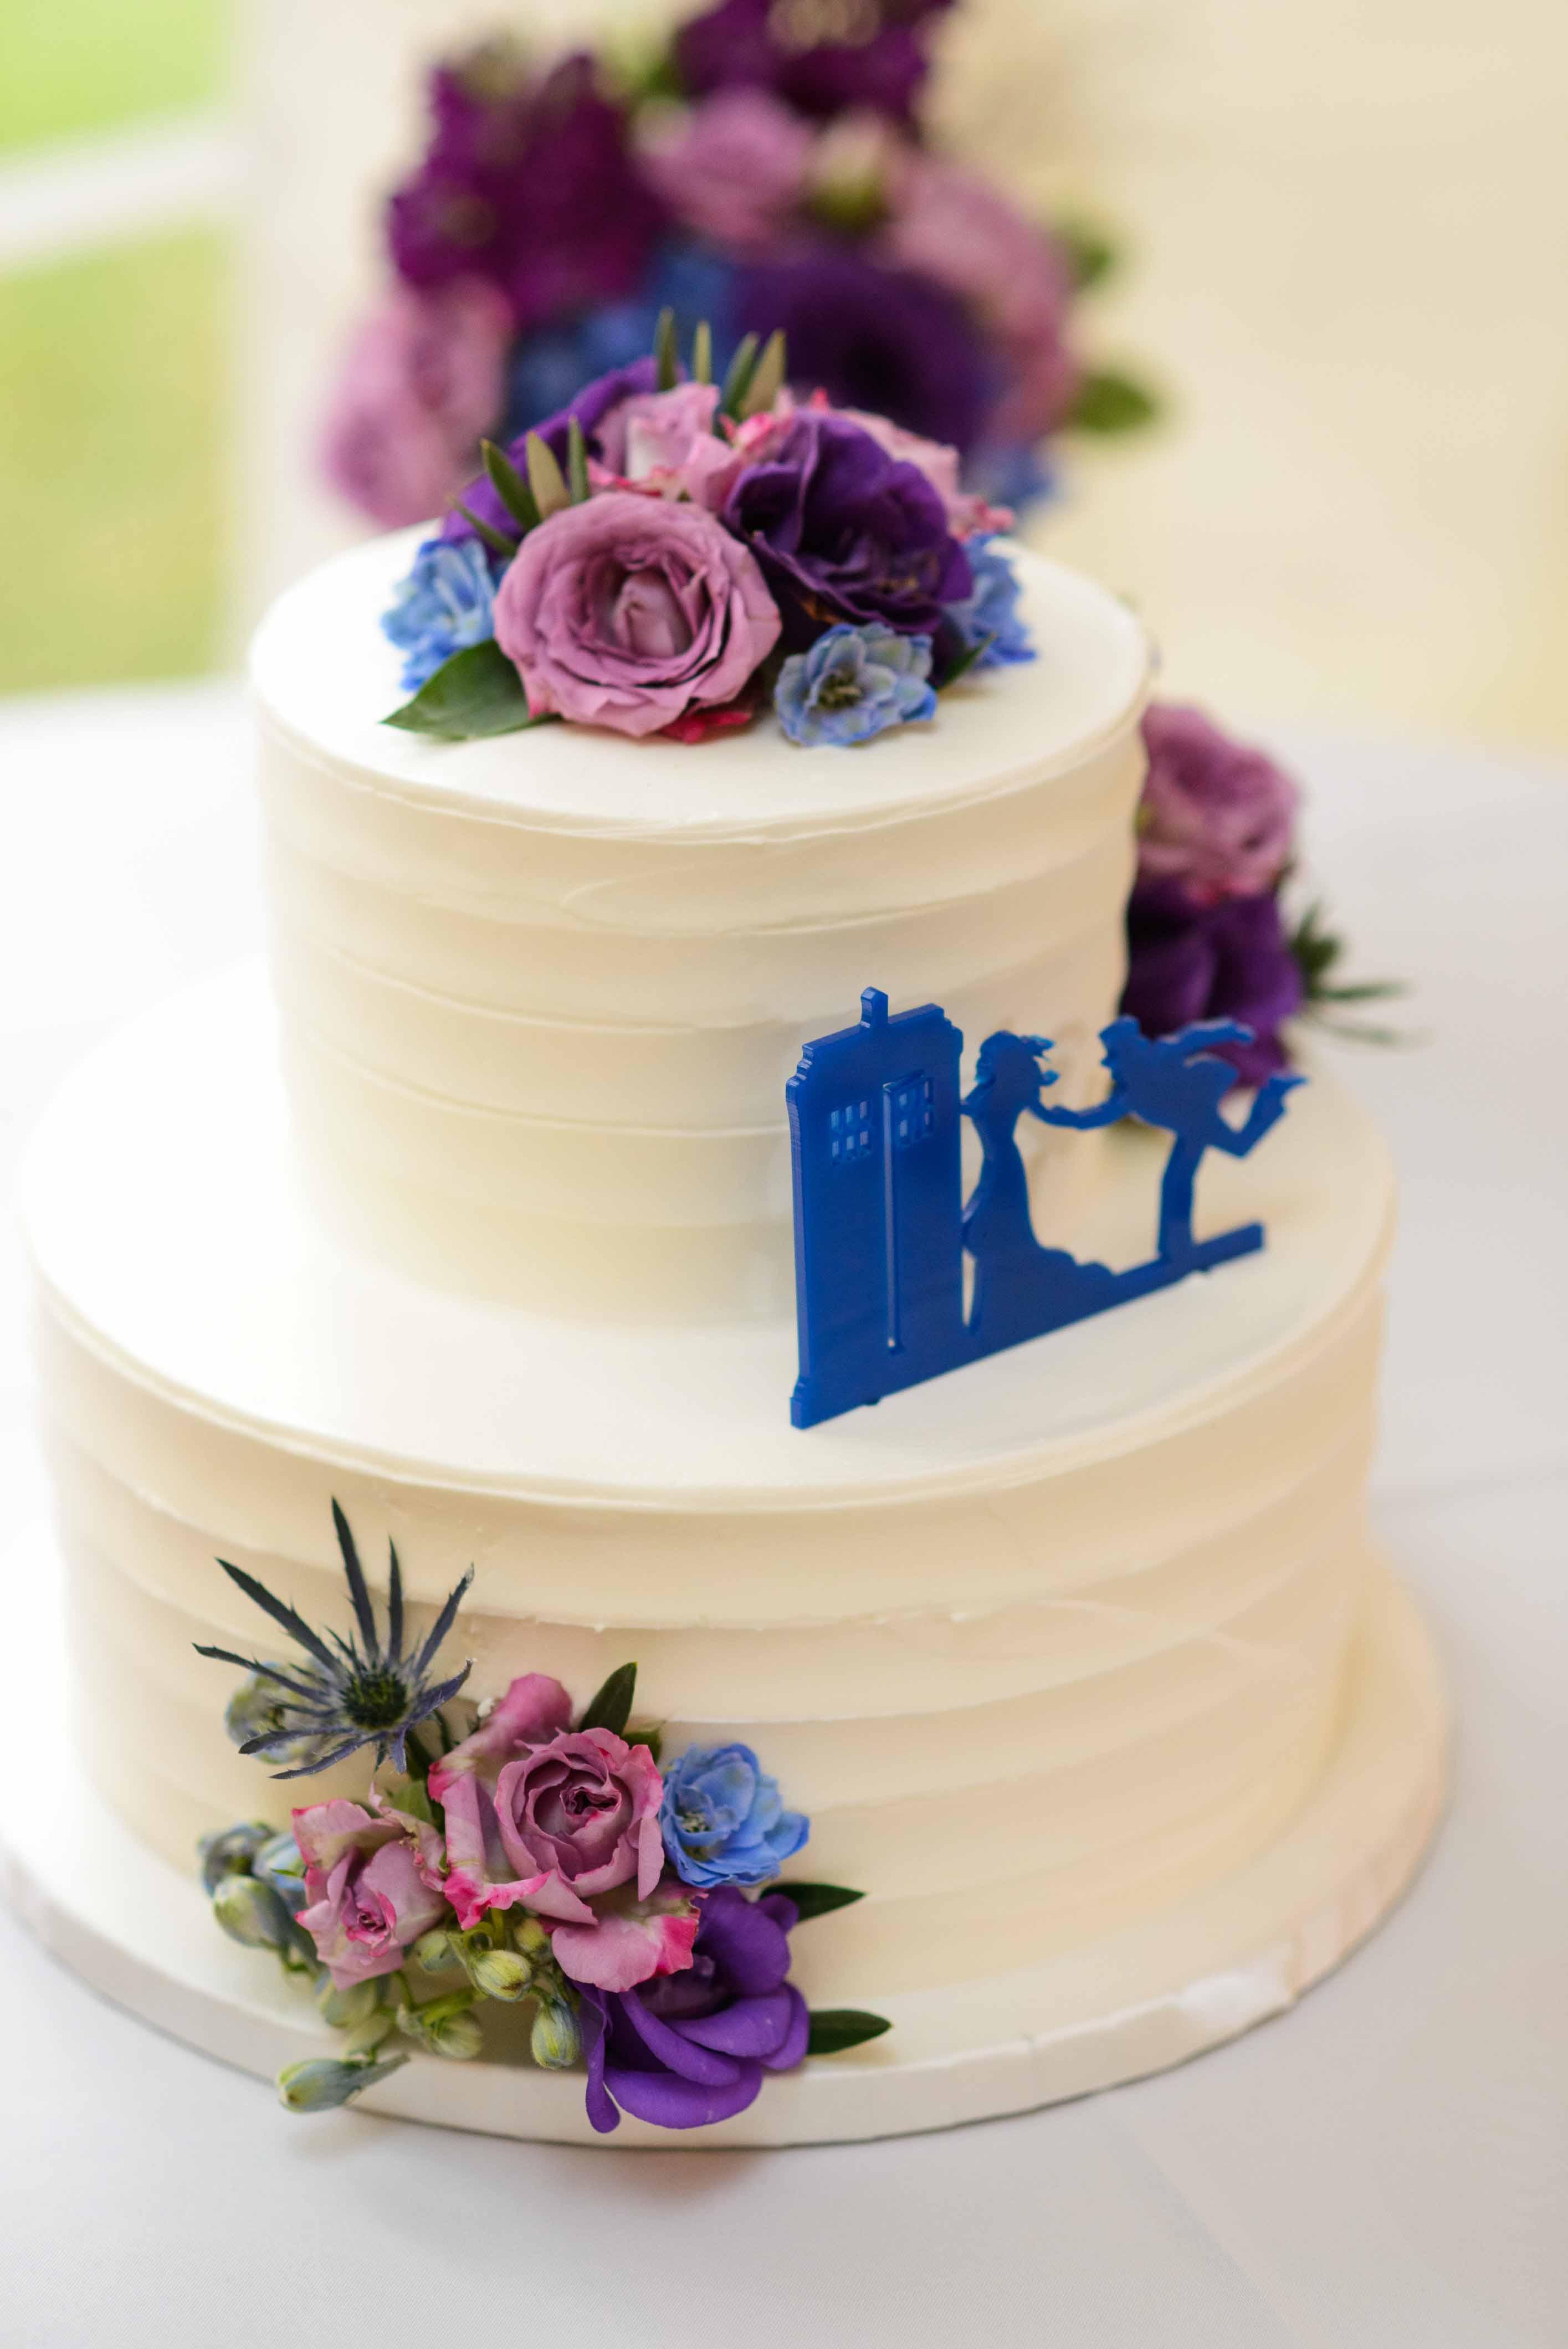 dr who wedding cake - sci fi wedding cake - alternative wedding ideas - unconventional wedding